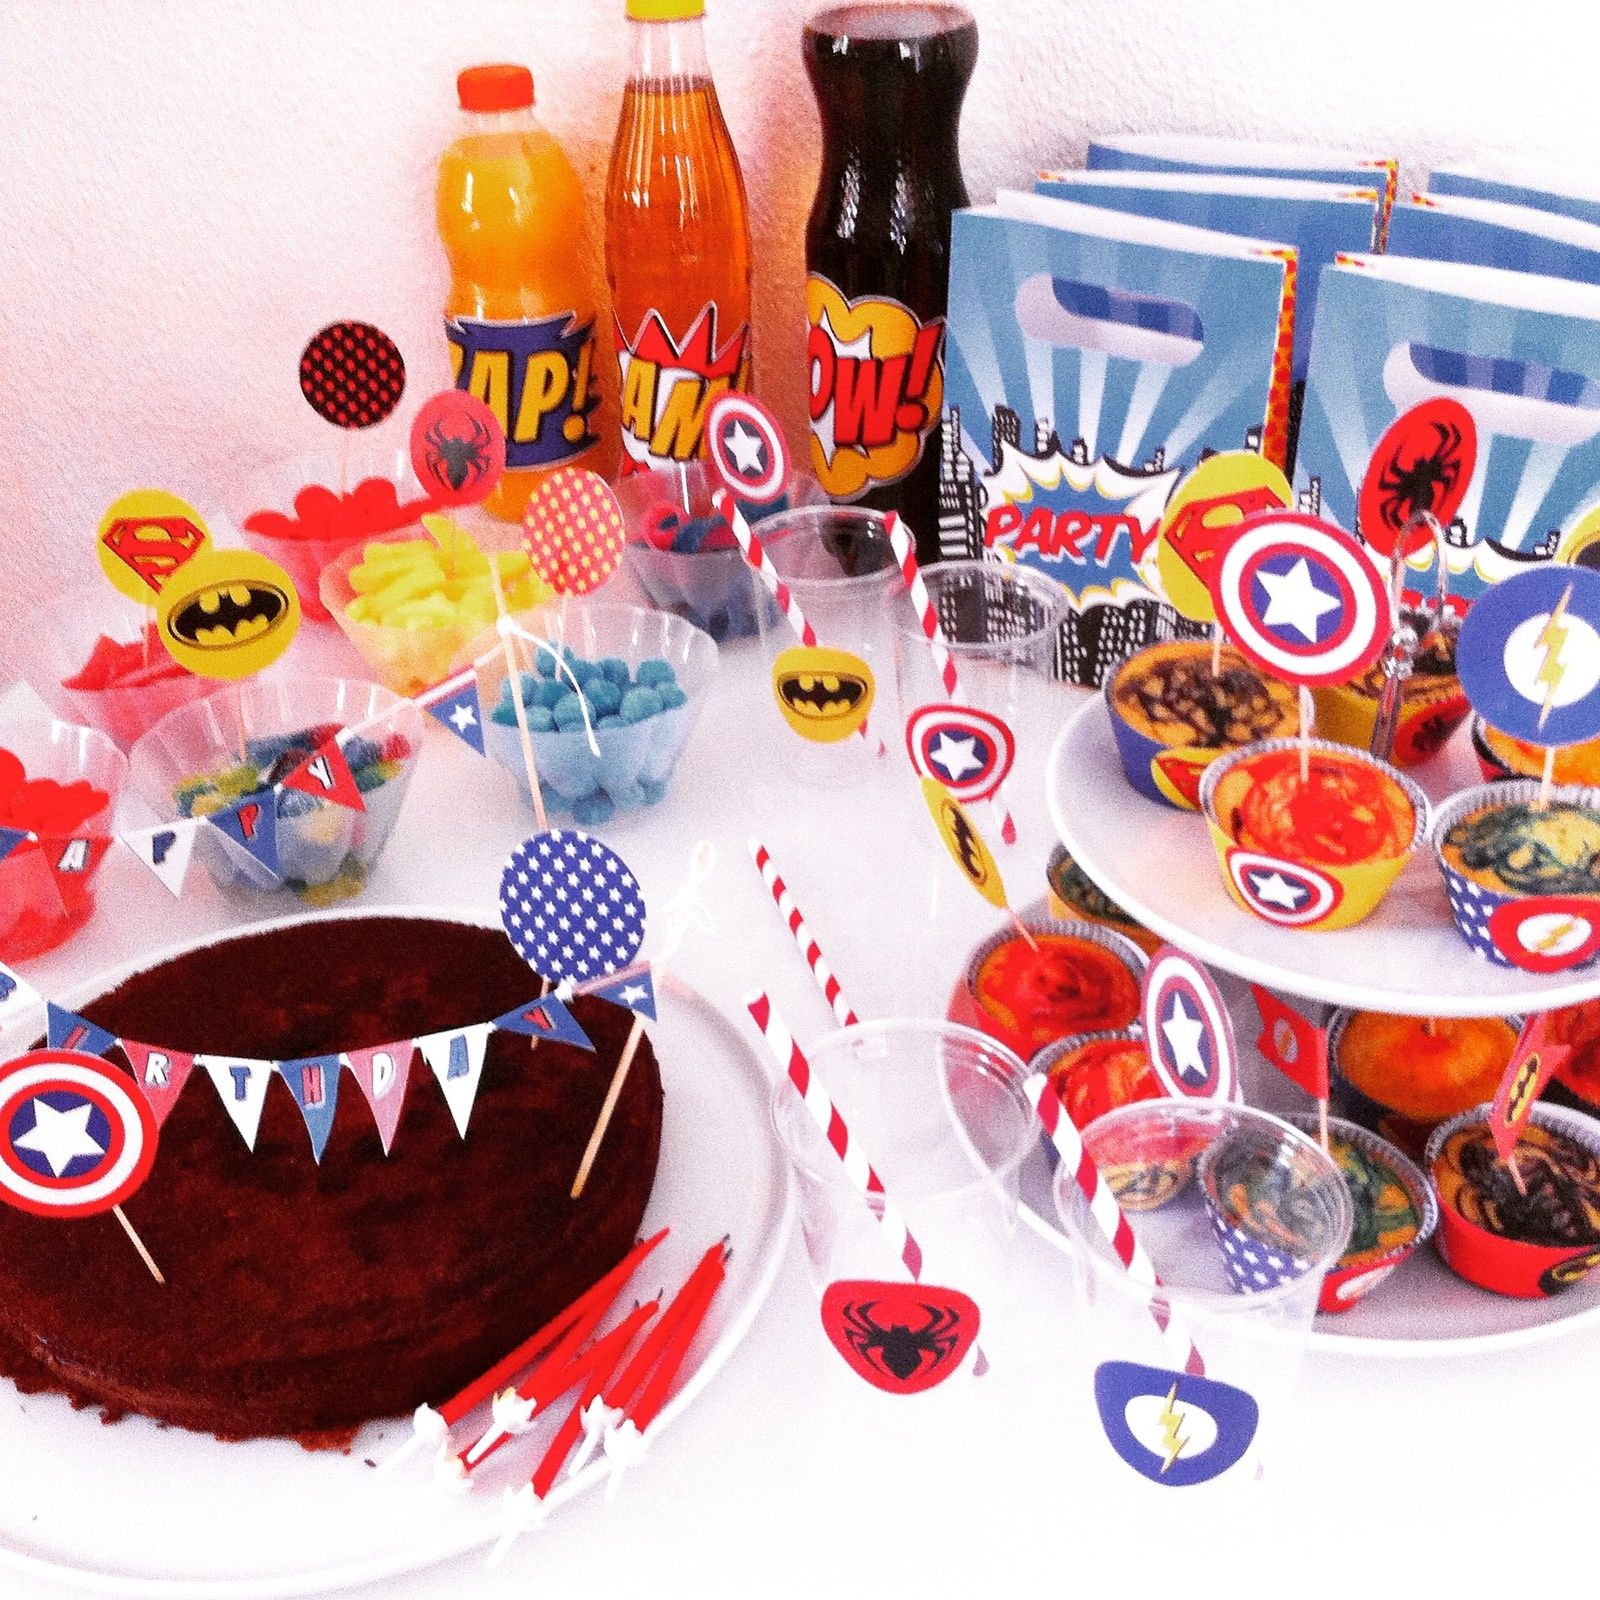 anniversaire super hros gateau captain america wrappers super hros toppers super - Gateau Anniversaire Super Heros